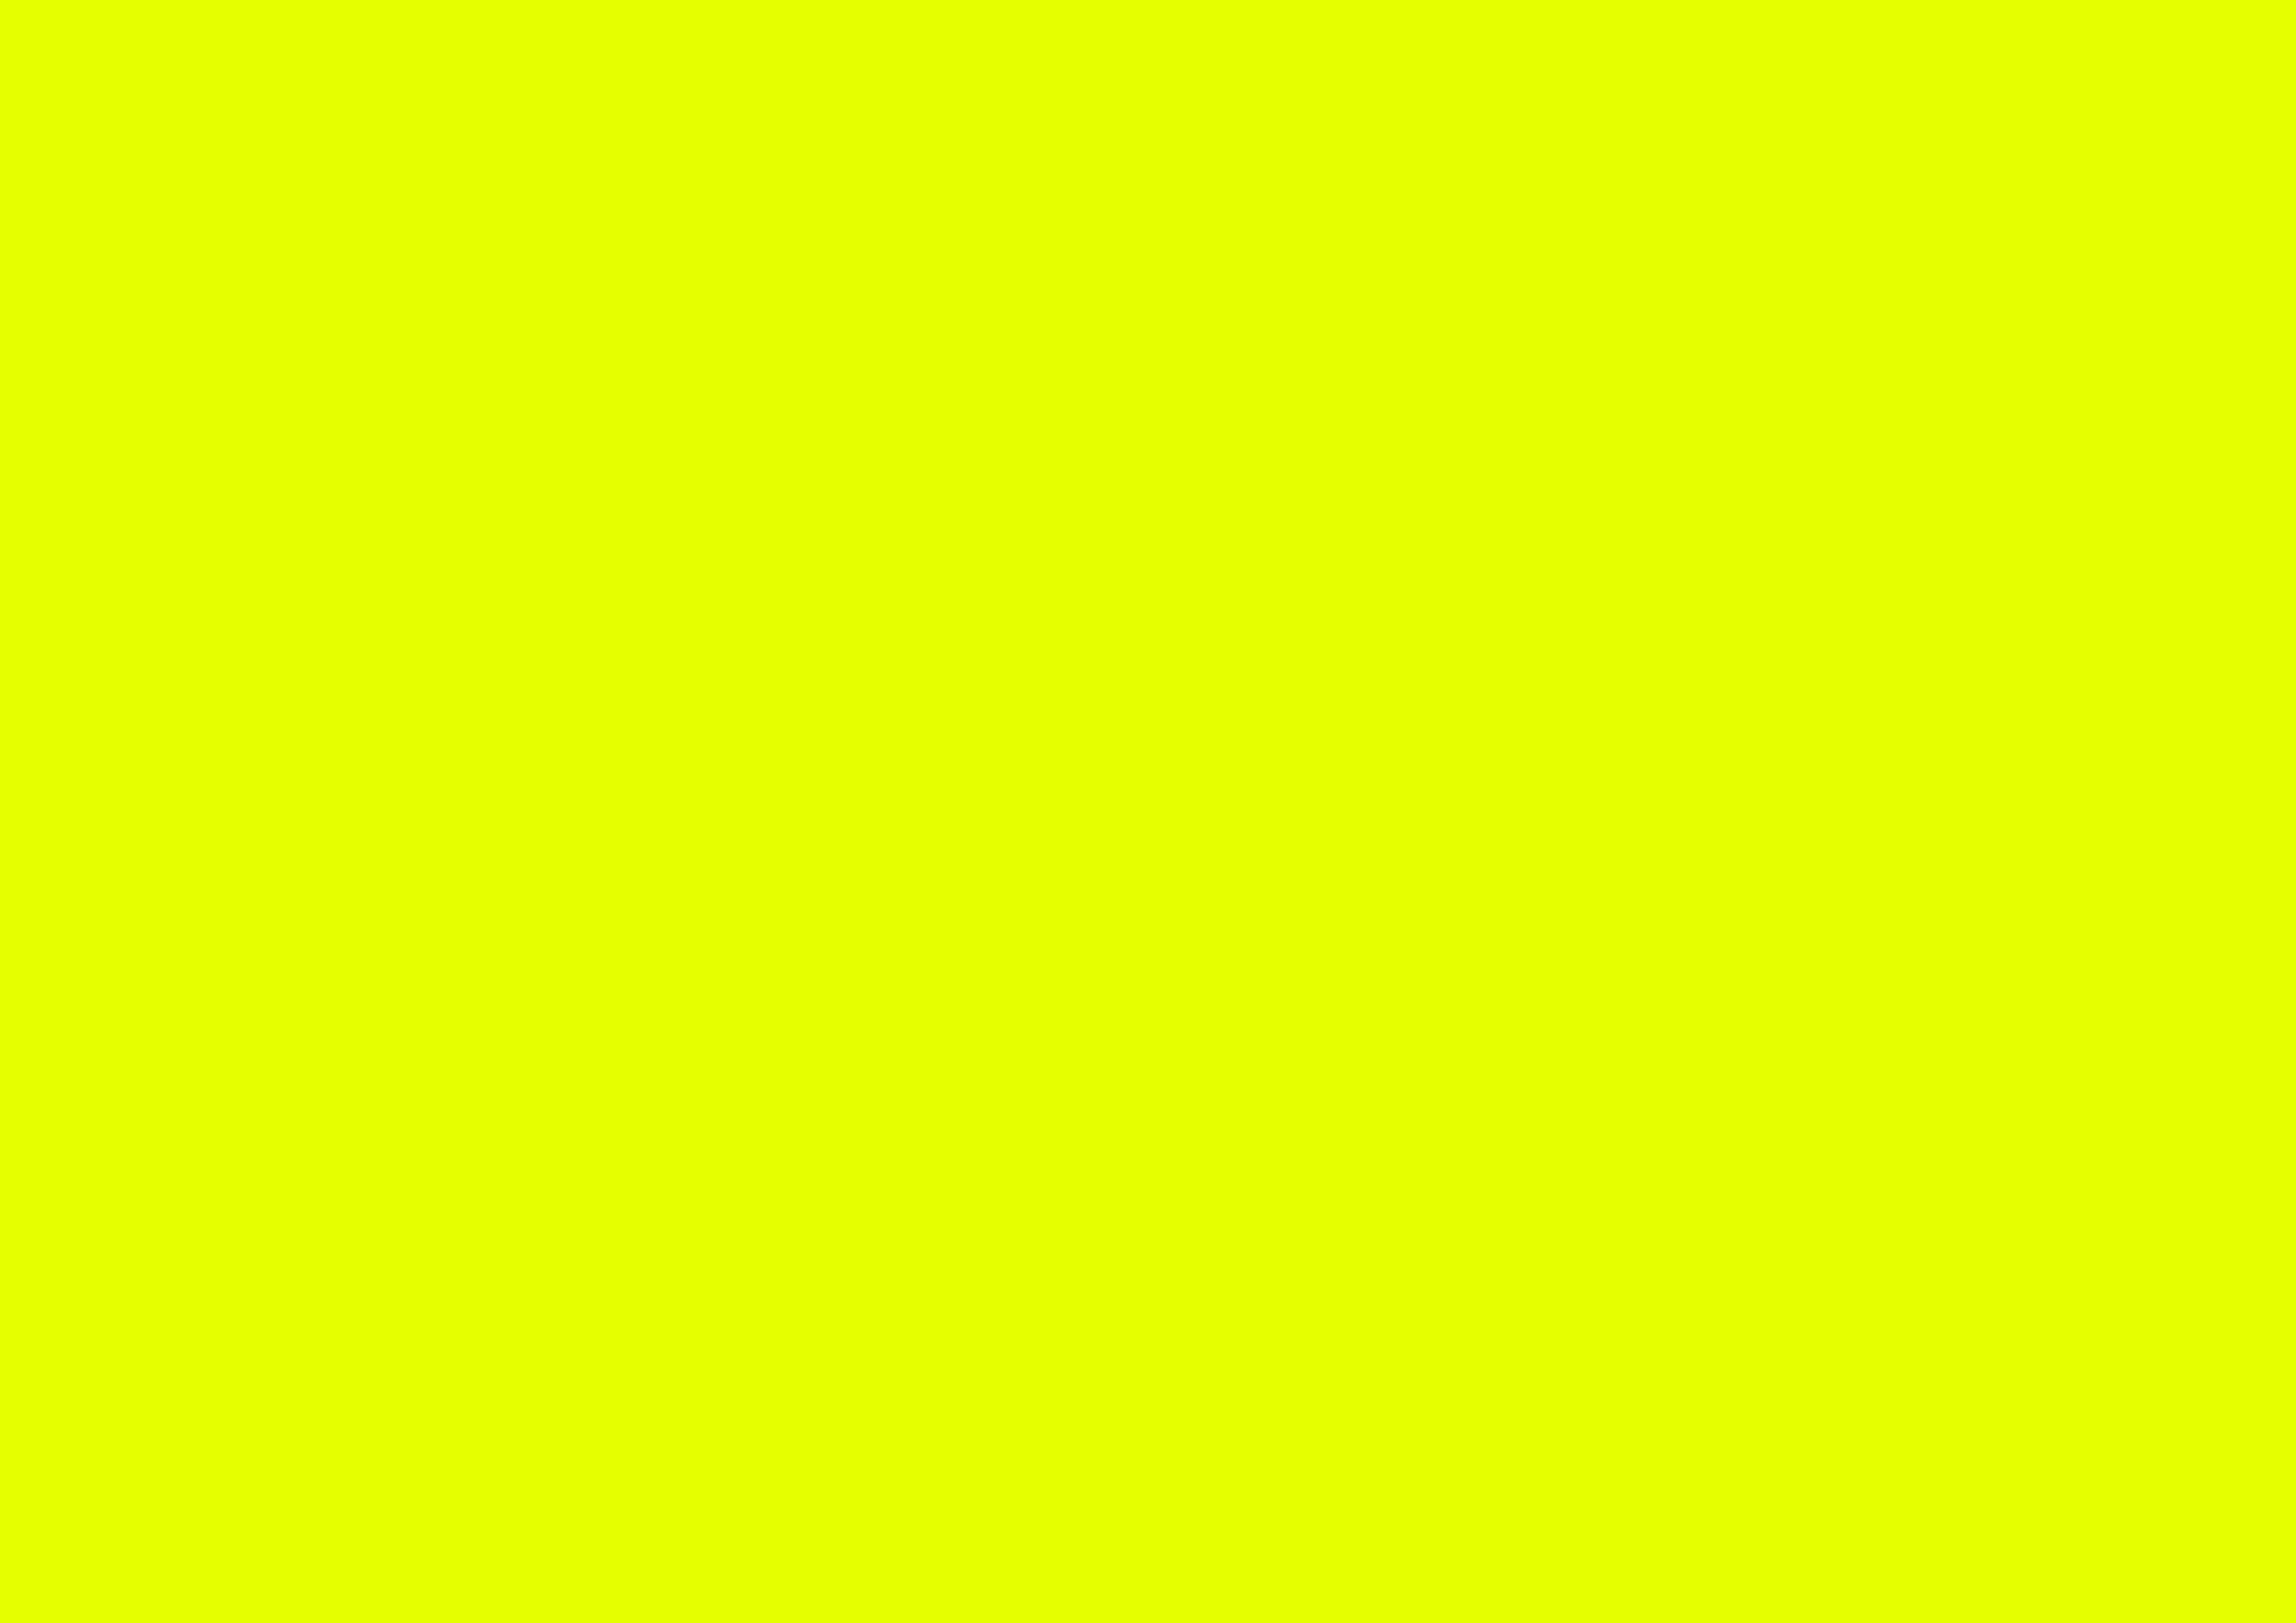 3508x2480 Lemon Lime Solid Color Background